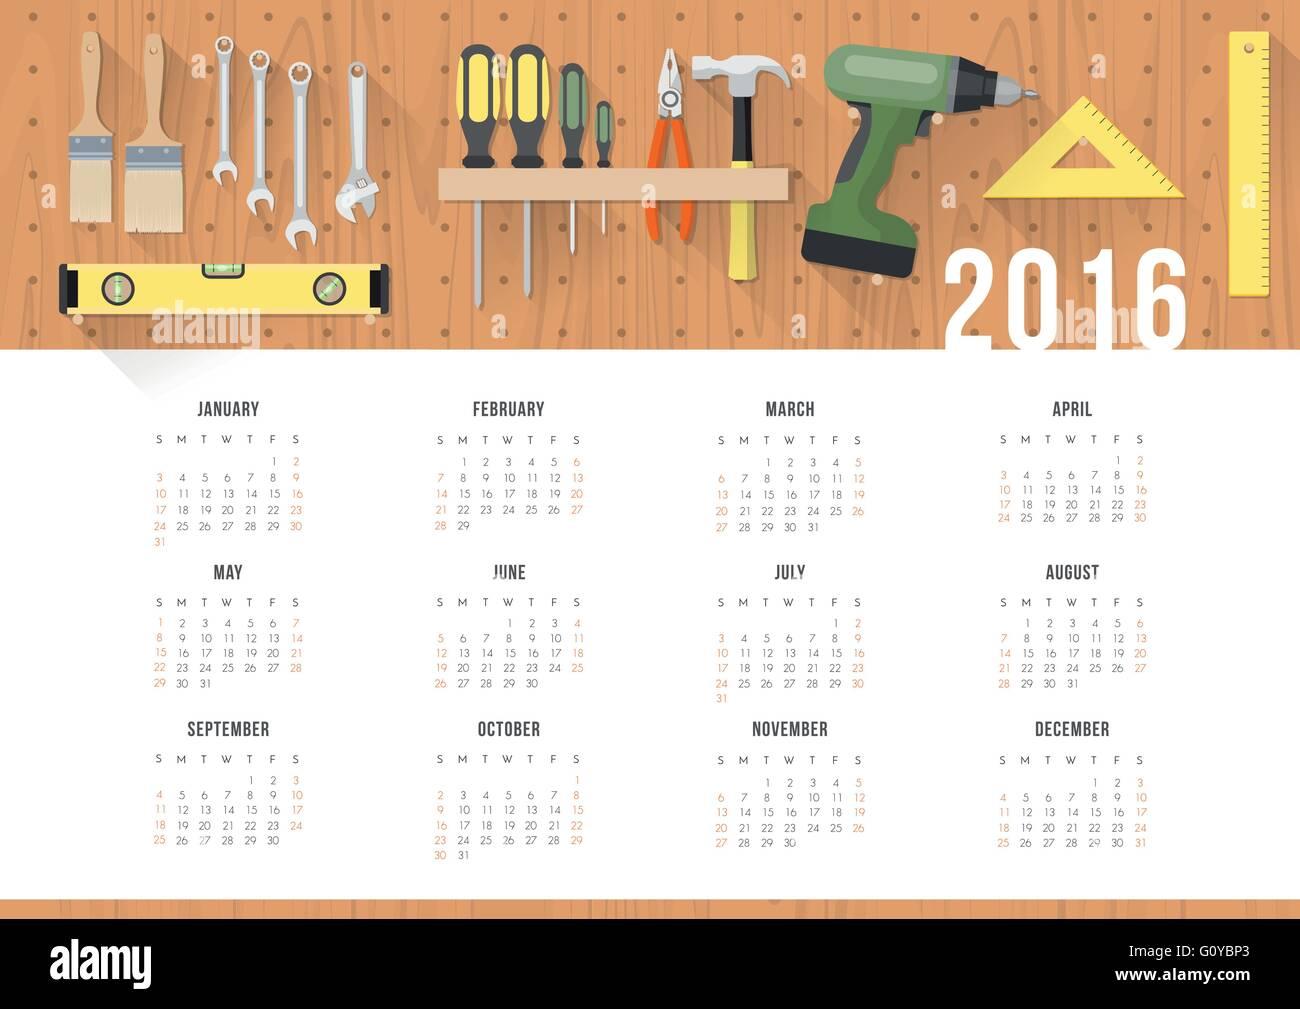 Calendar Hanging Stockfotos & Calendar Hanging Bilder - Alamy